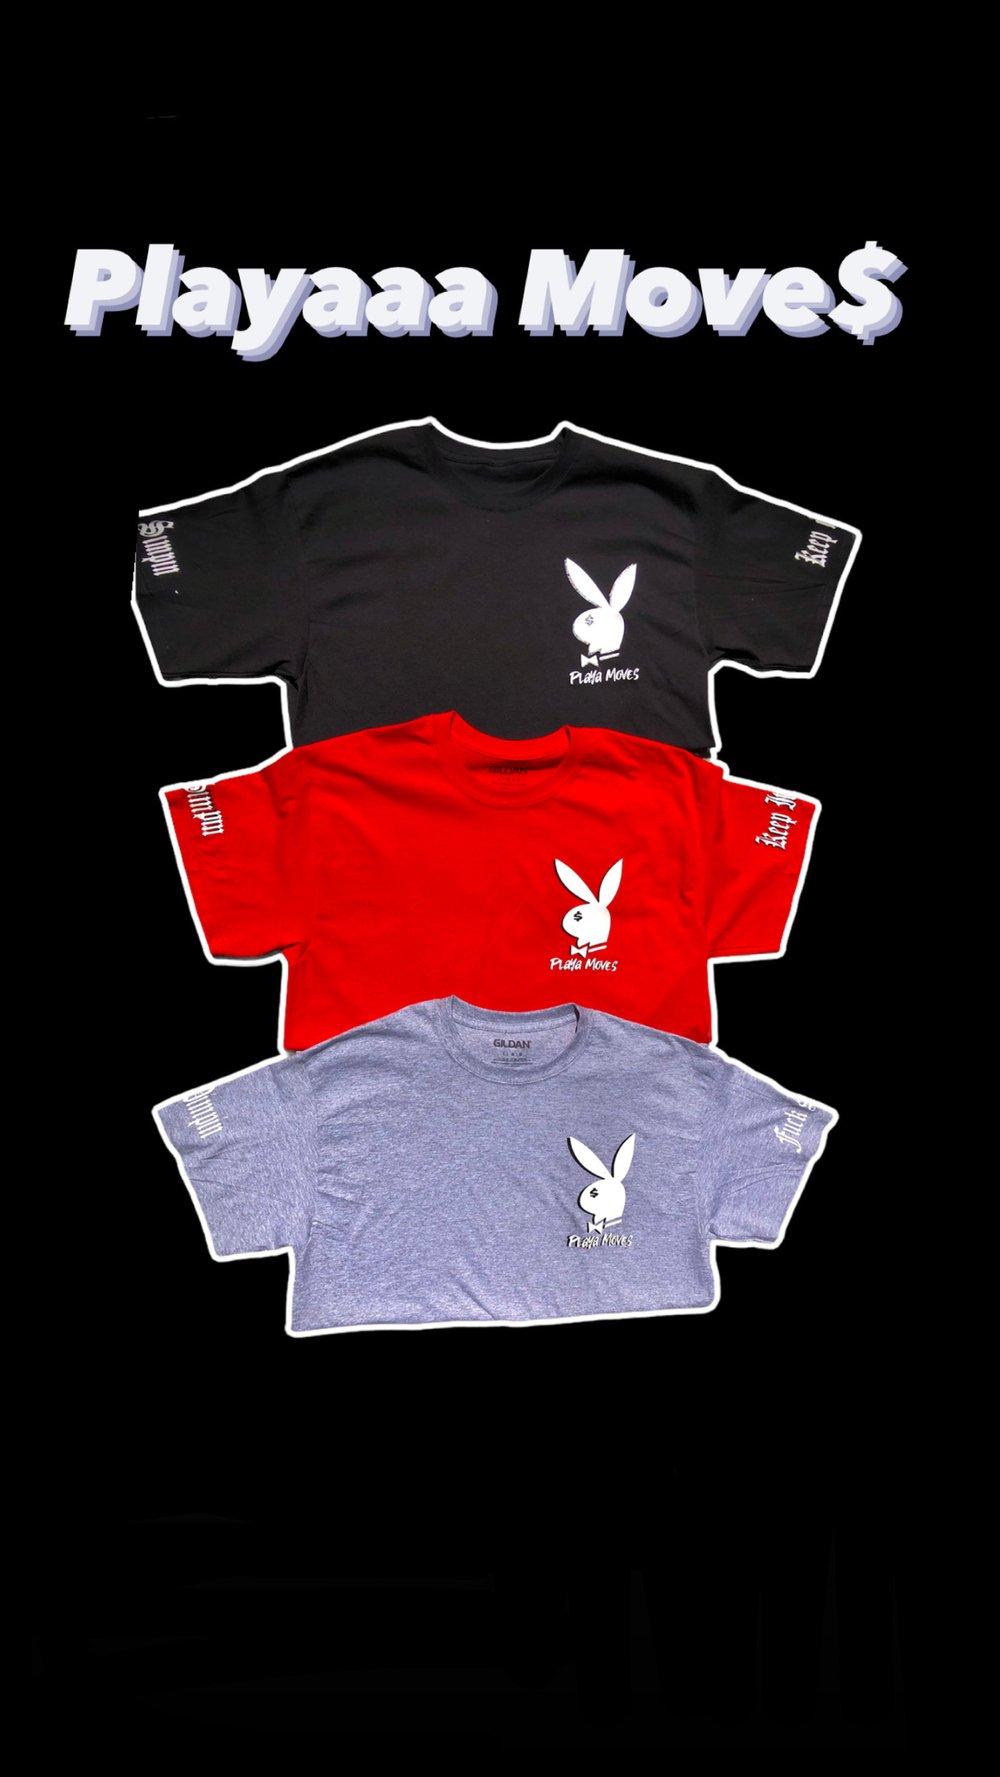 Playa Move$ T-shirt